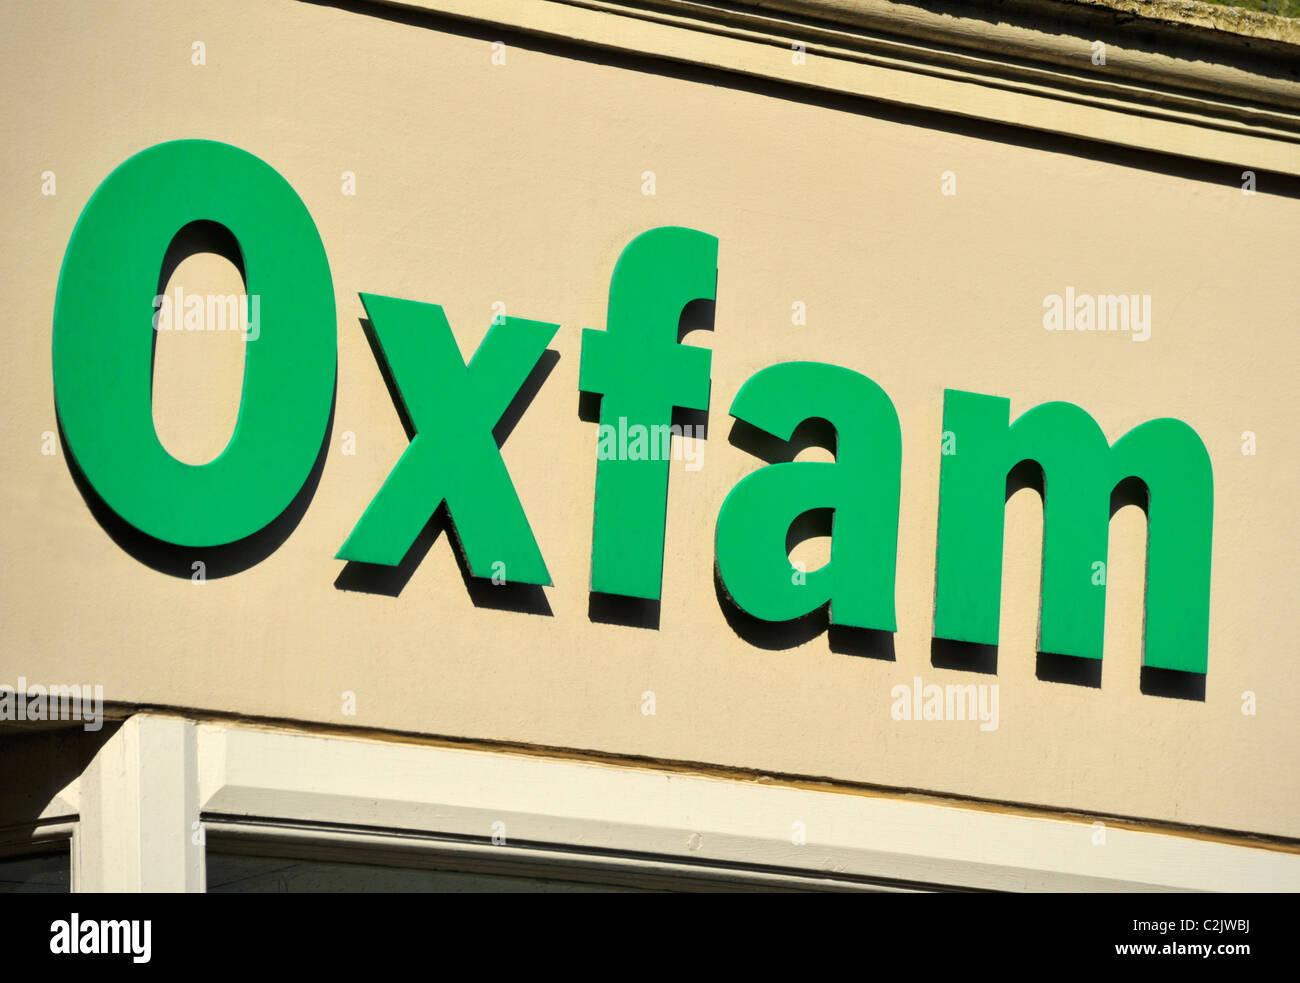 oxfam-bookshop-logo-penny-street-lancaster-lancashire-england-united-C2JWBJ.jpg